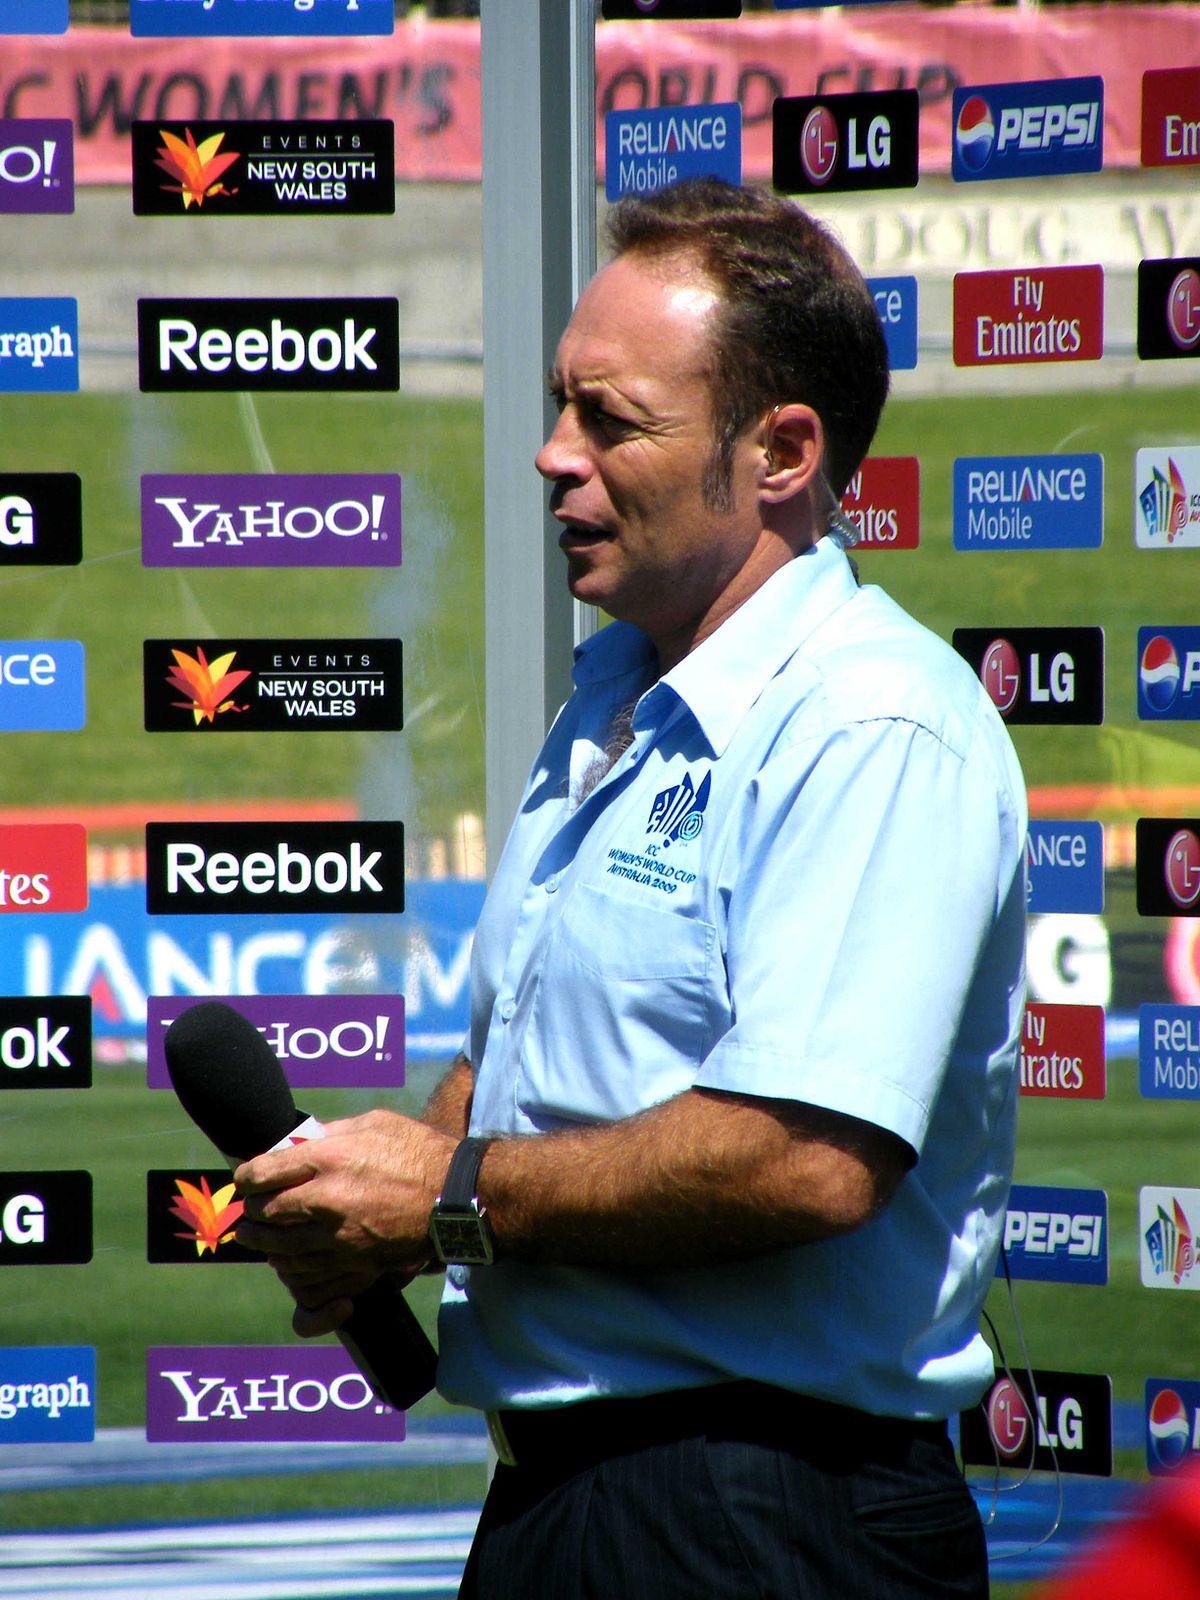 Danny Morrison Cricketer